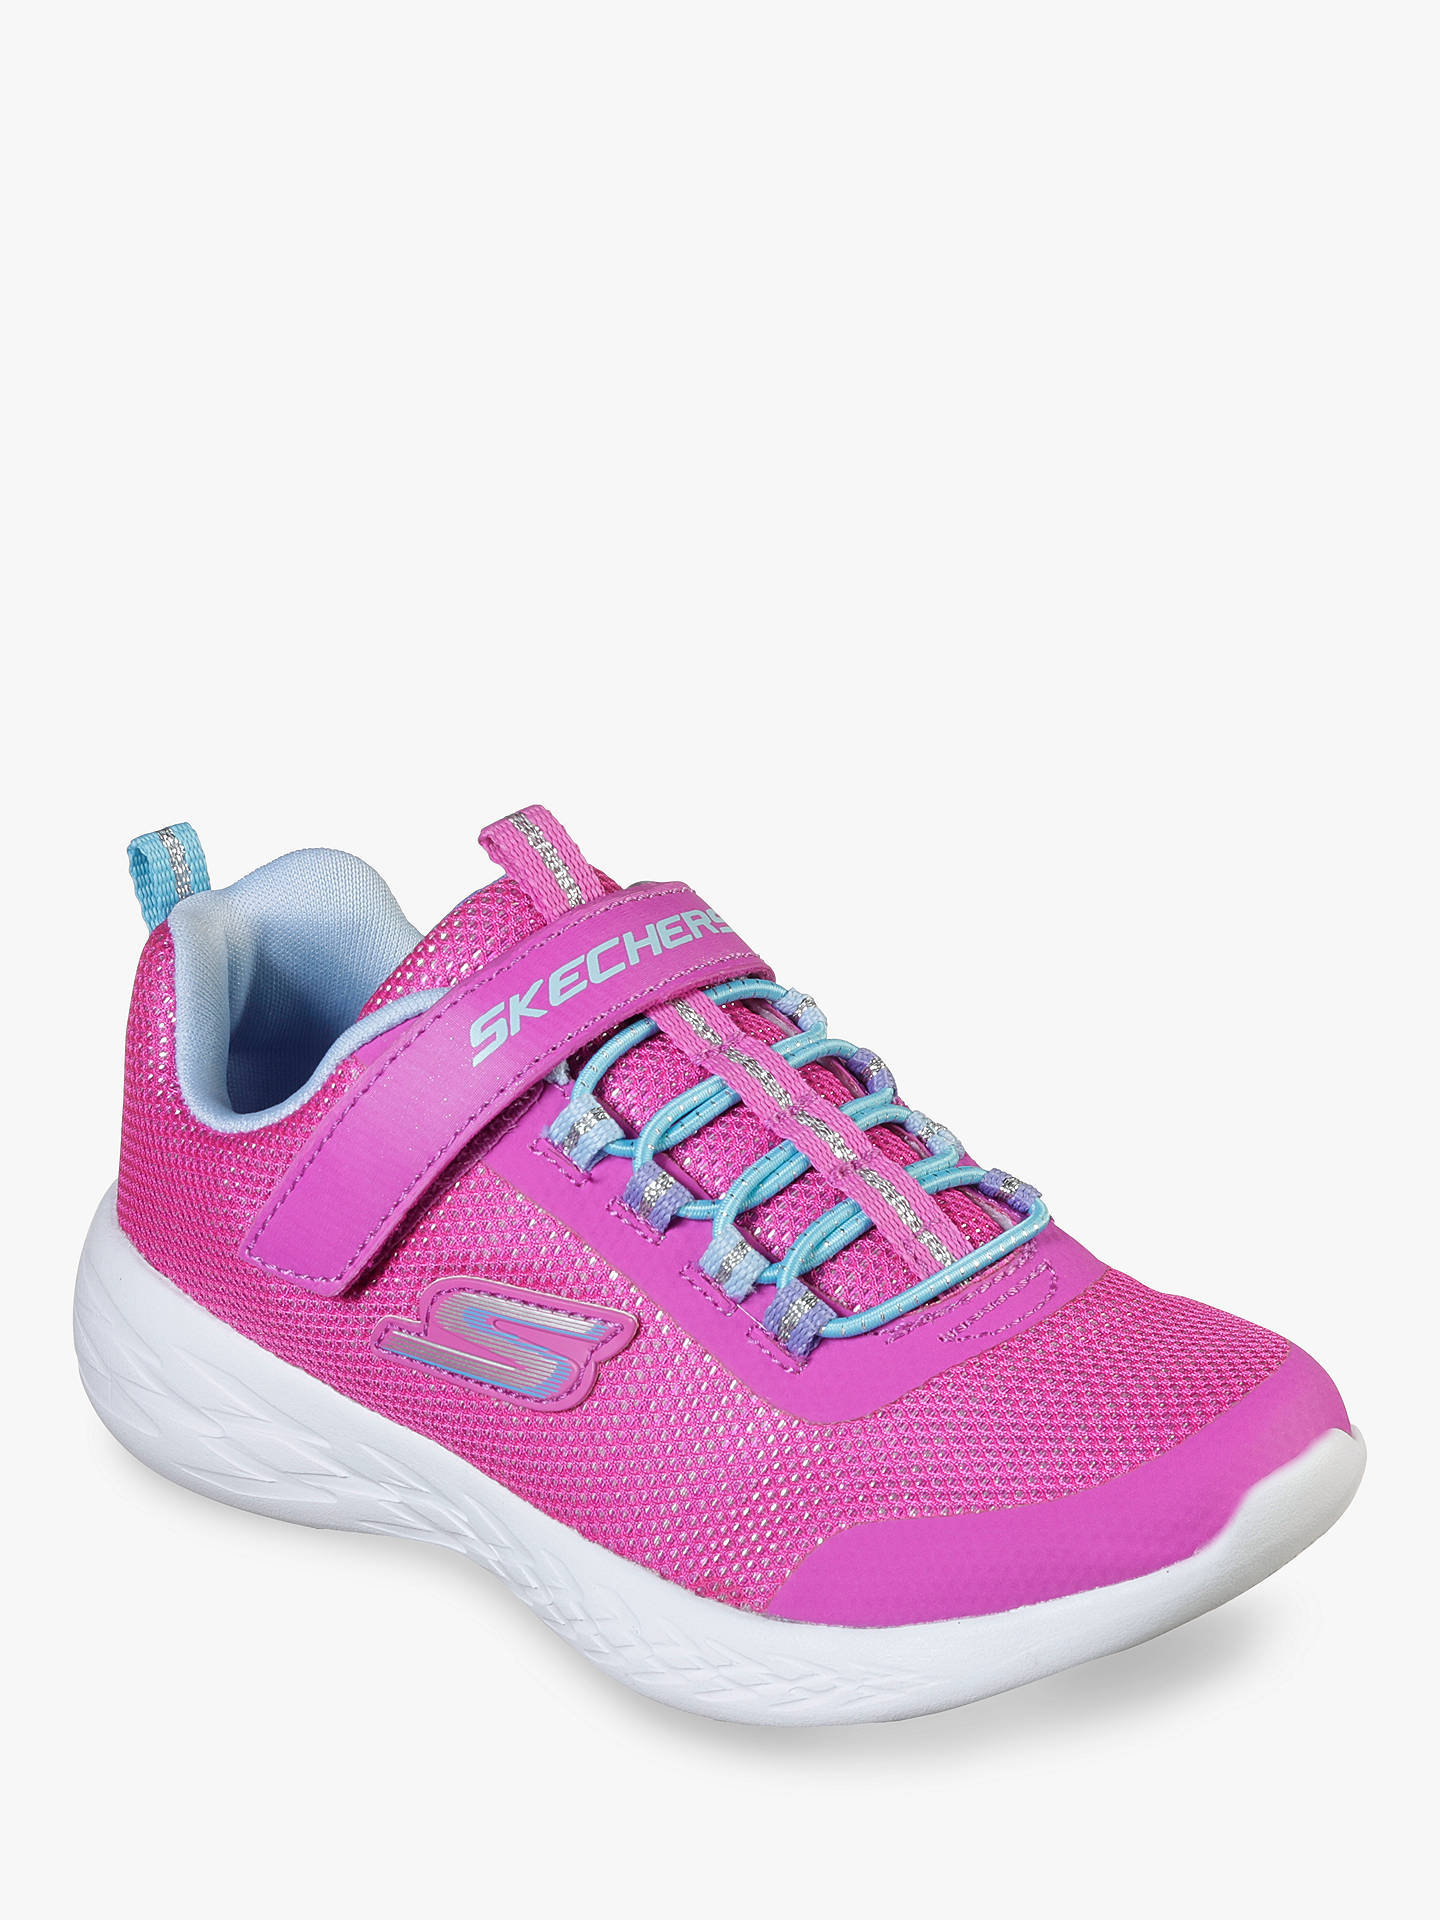 b081a9fe2a88 Buy Skechers Children s Go Run 600 Sparkle Run Trainers